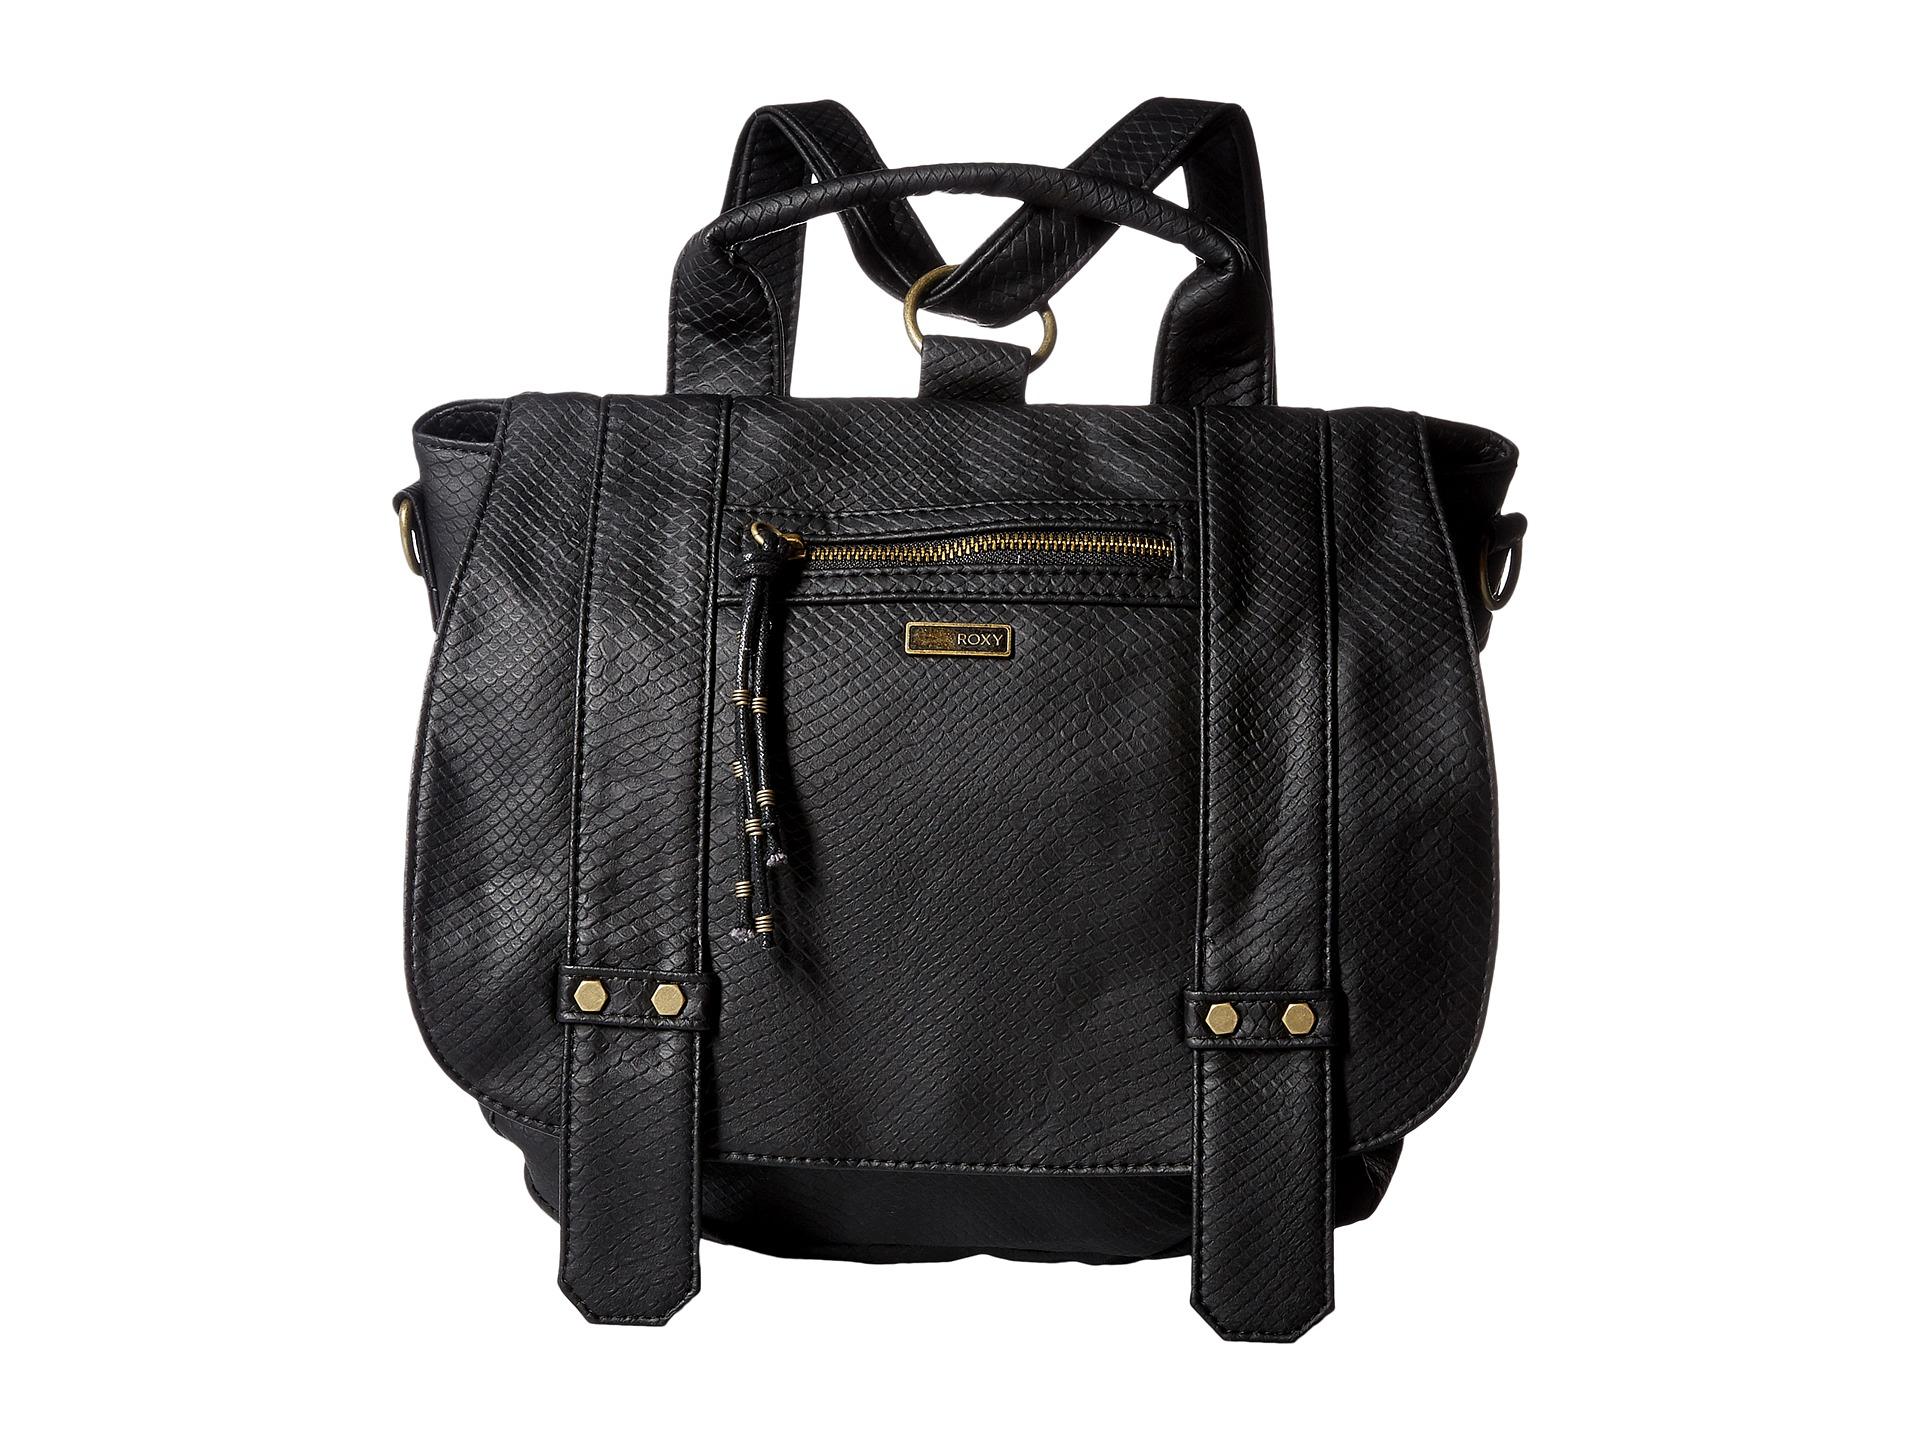 Lyst - Roxy Magnolia Bay Bag in Black